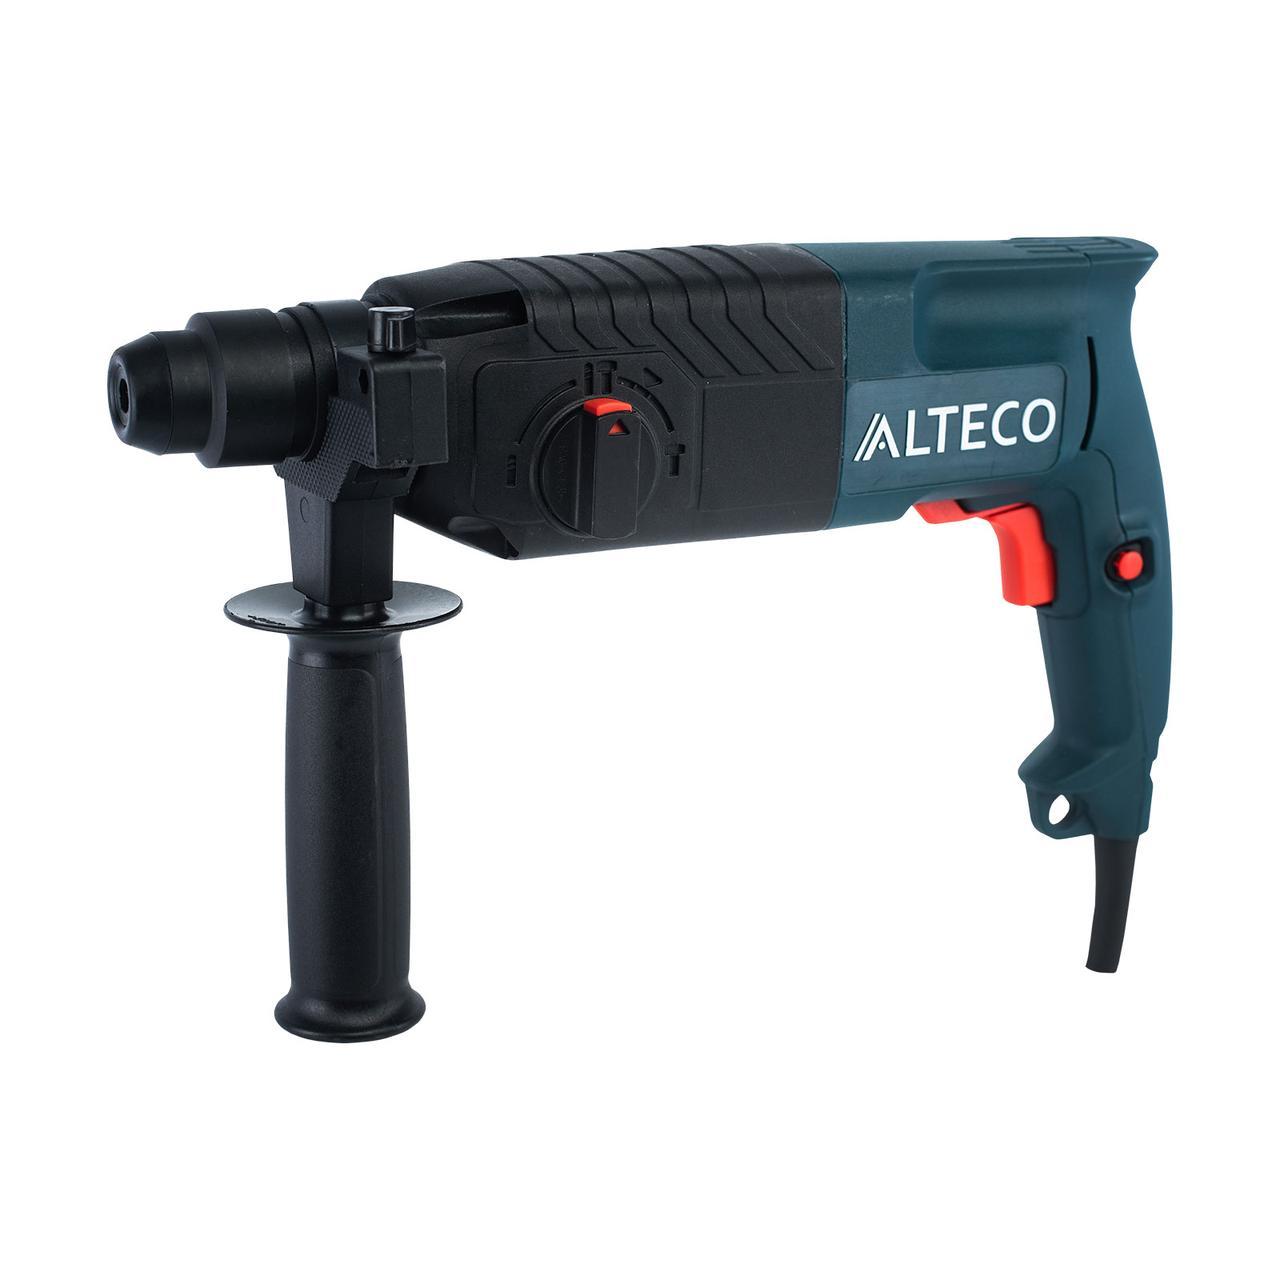 Перфоратор ALTECO RH 650-24